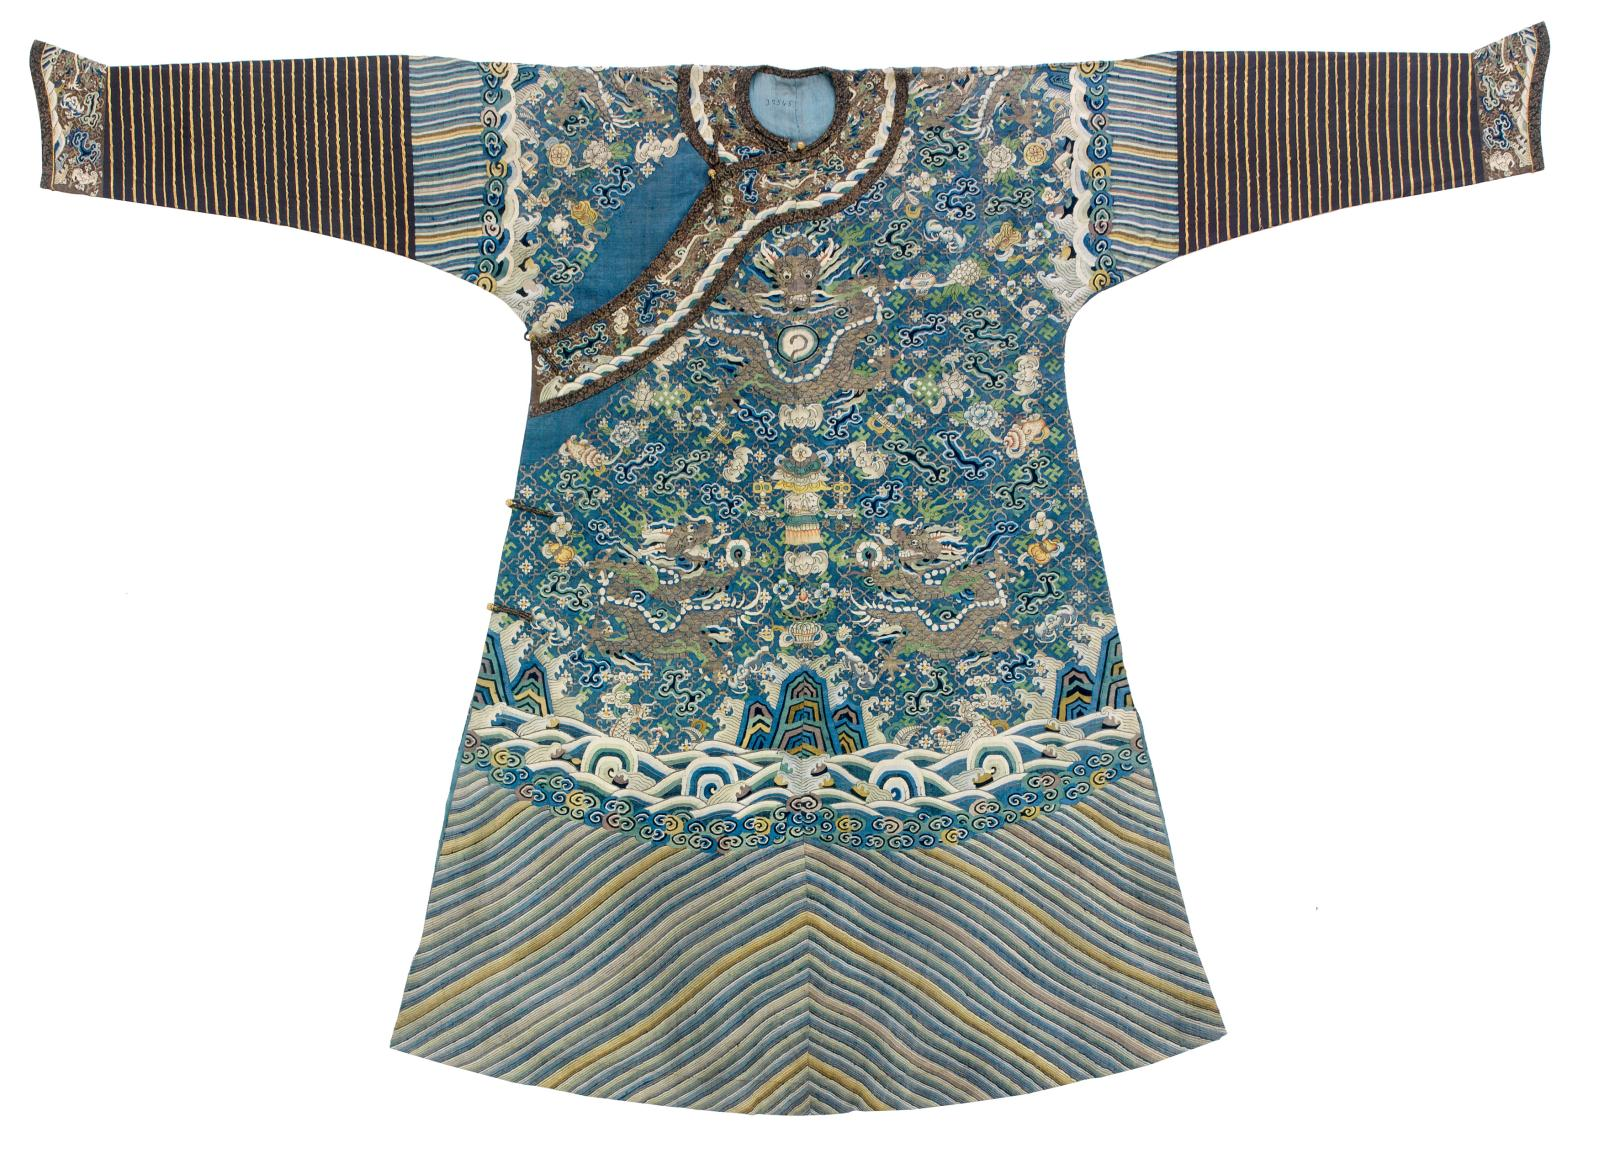 Robe de cour masculine semi-formelle, ou jifu, Chine, dynastie Qing, vers 1800-1830, soie.